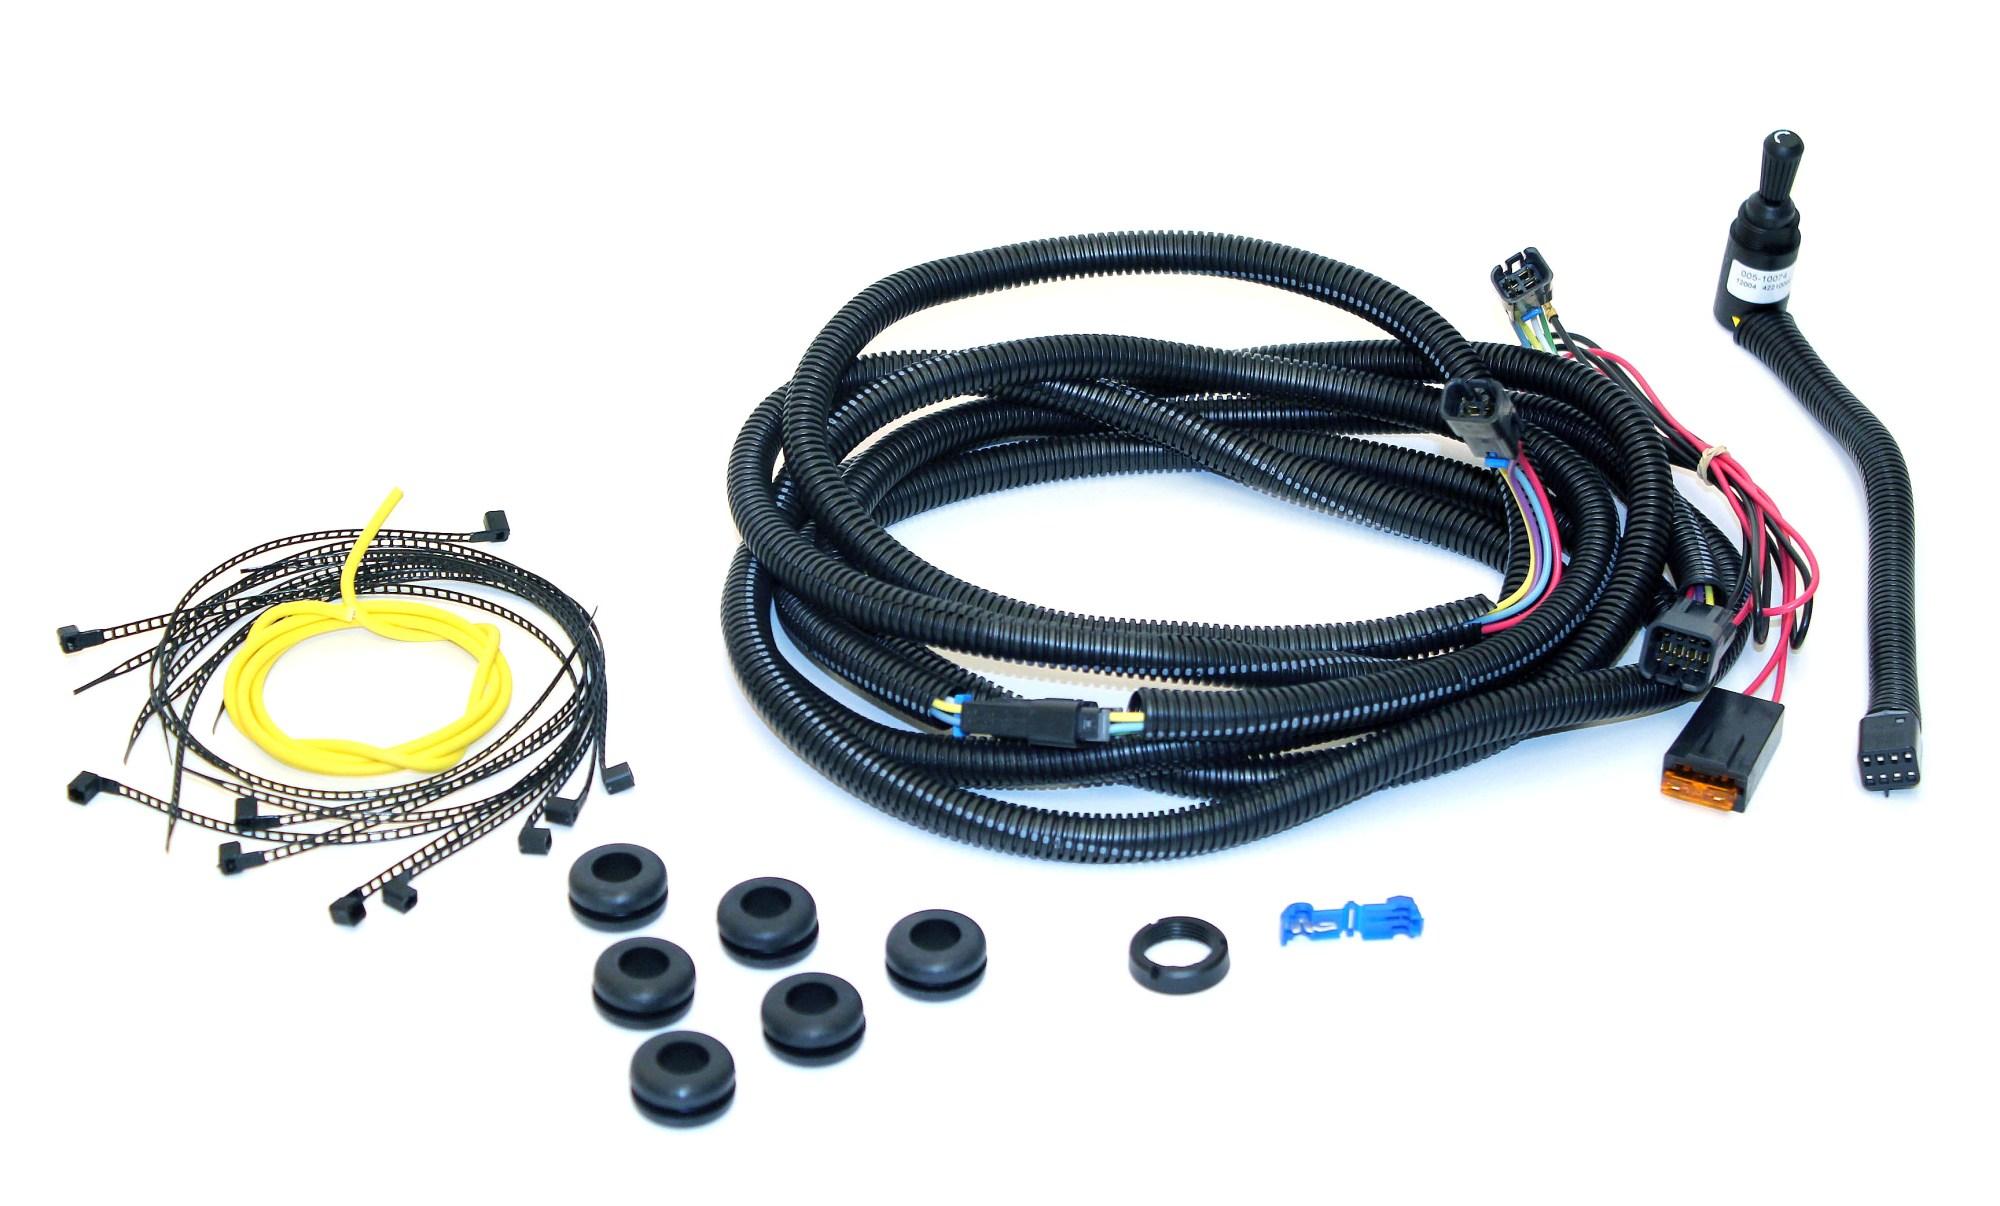 hight resolution of universal power mirror conversion loom requires hard wiring streetsceneeq com